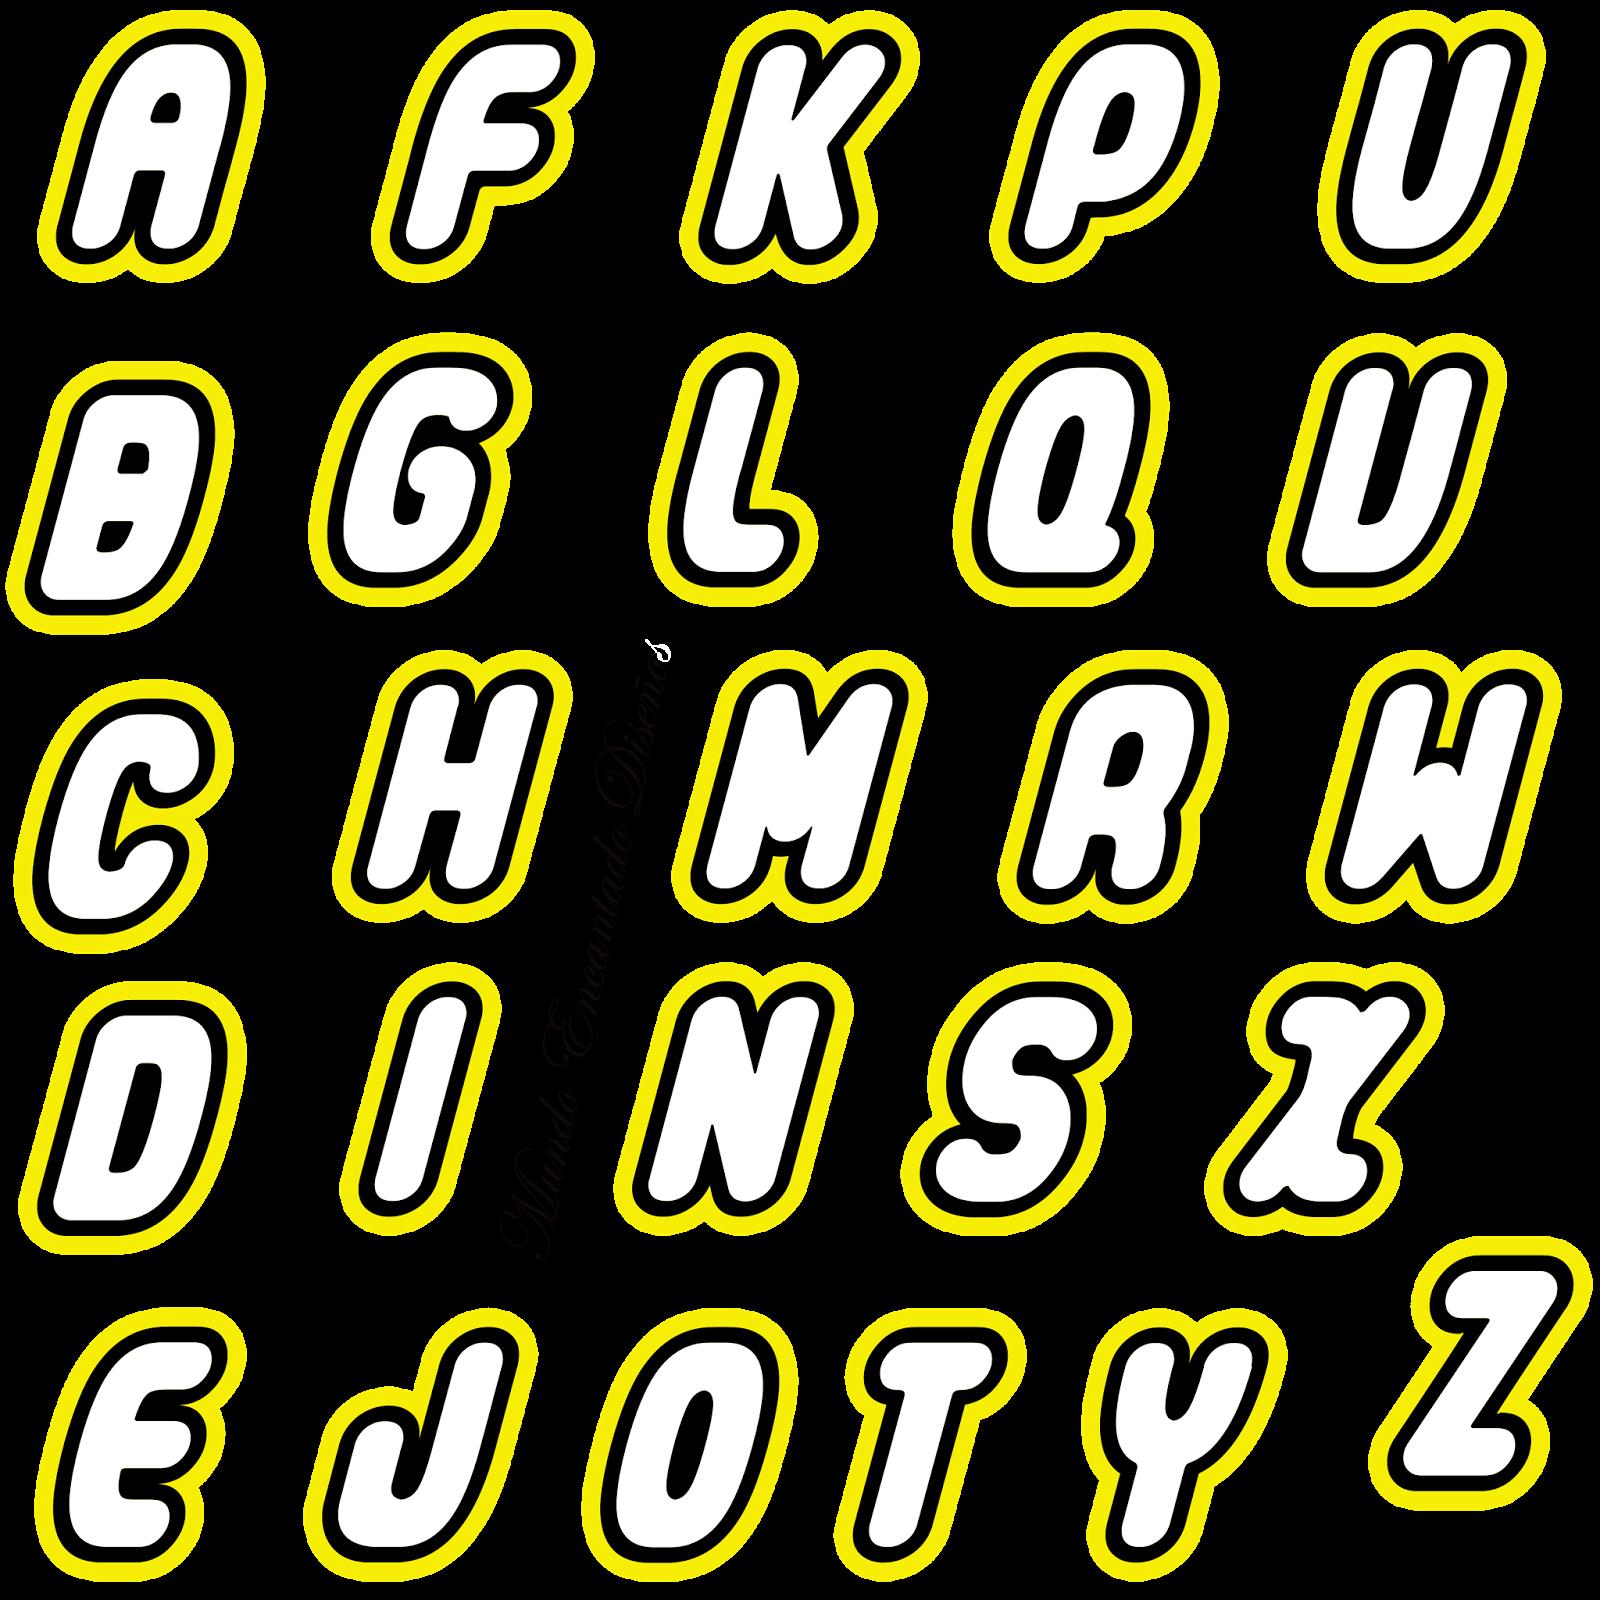 Lego font image by Rana Haboul on Lego birthday Lego